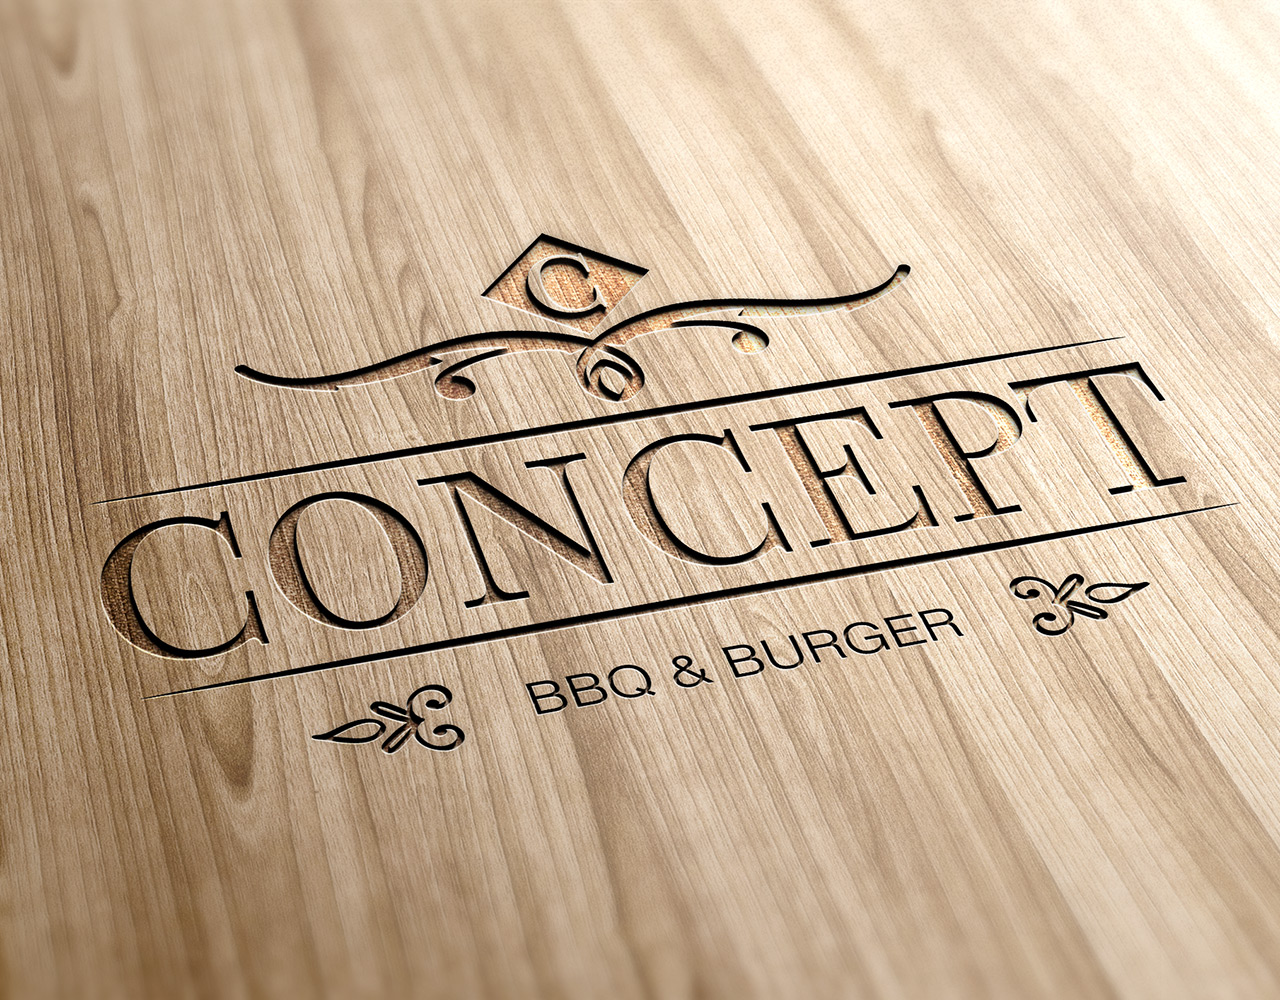 Concept burgers, σχεδιασμός λογοτύπου